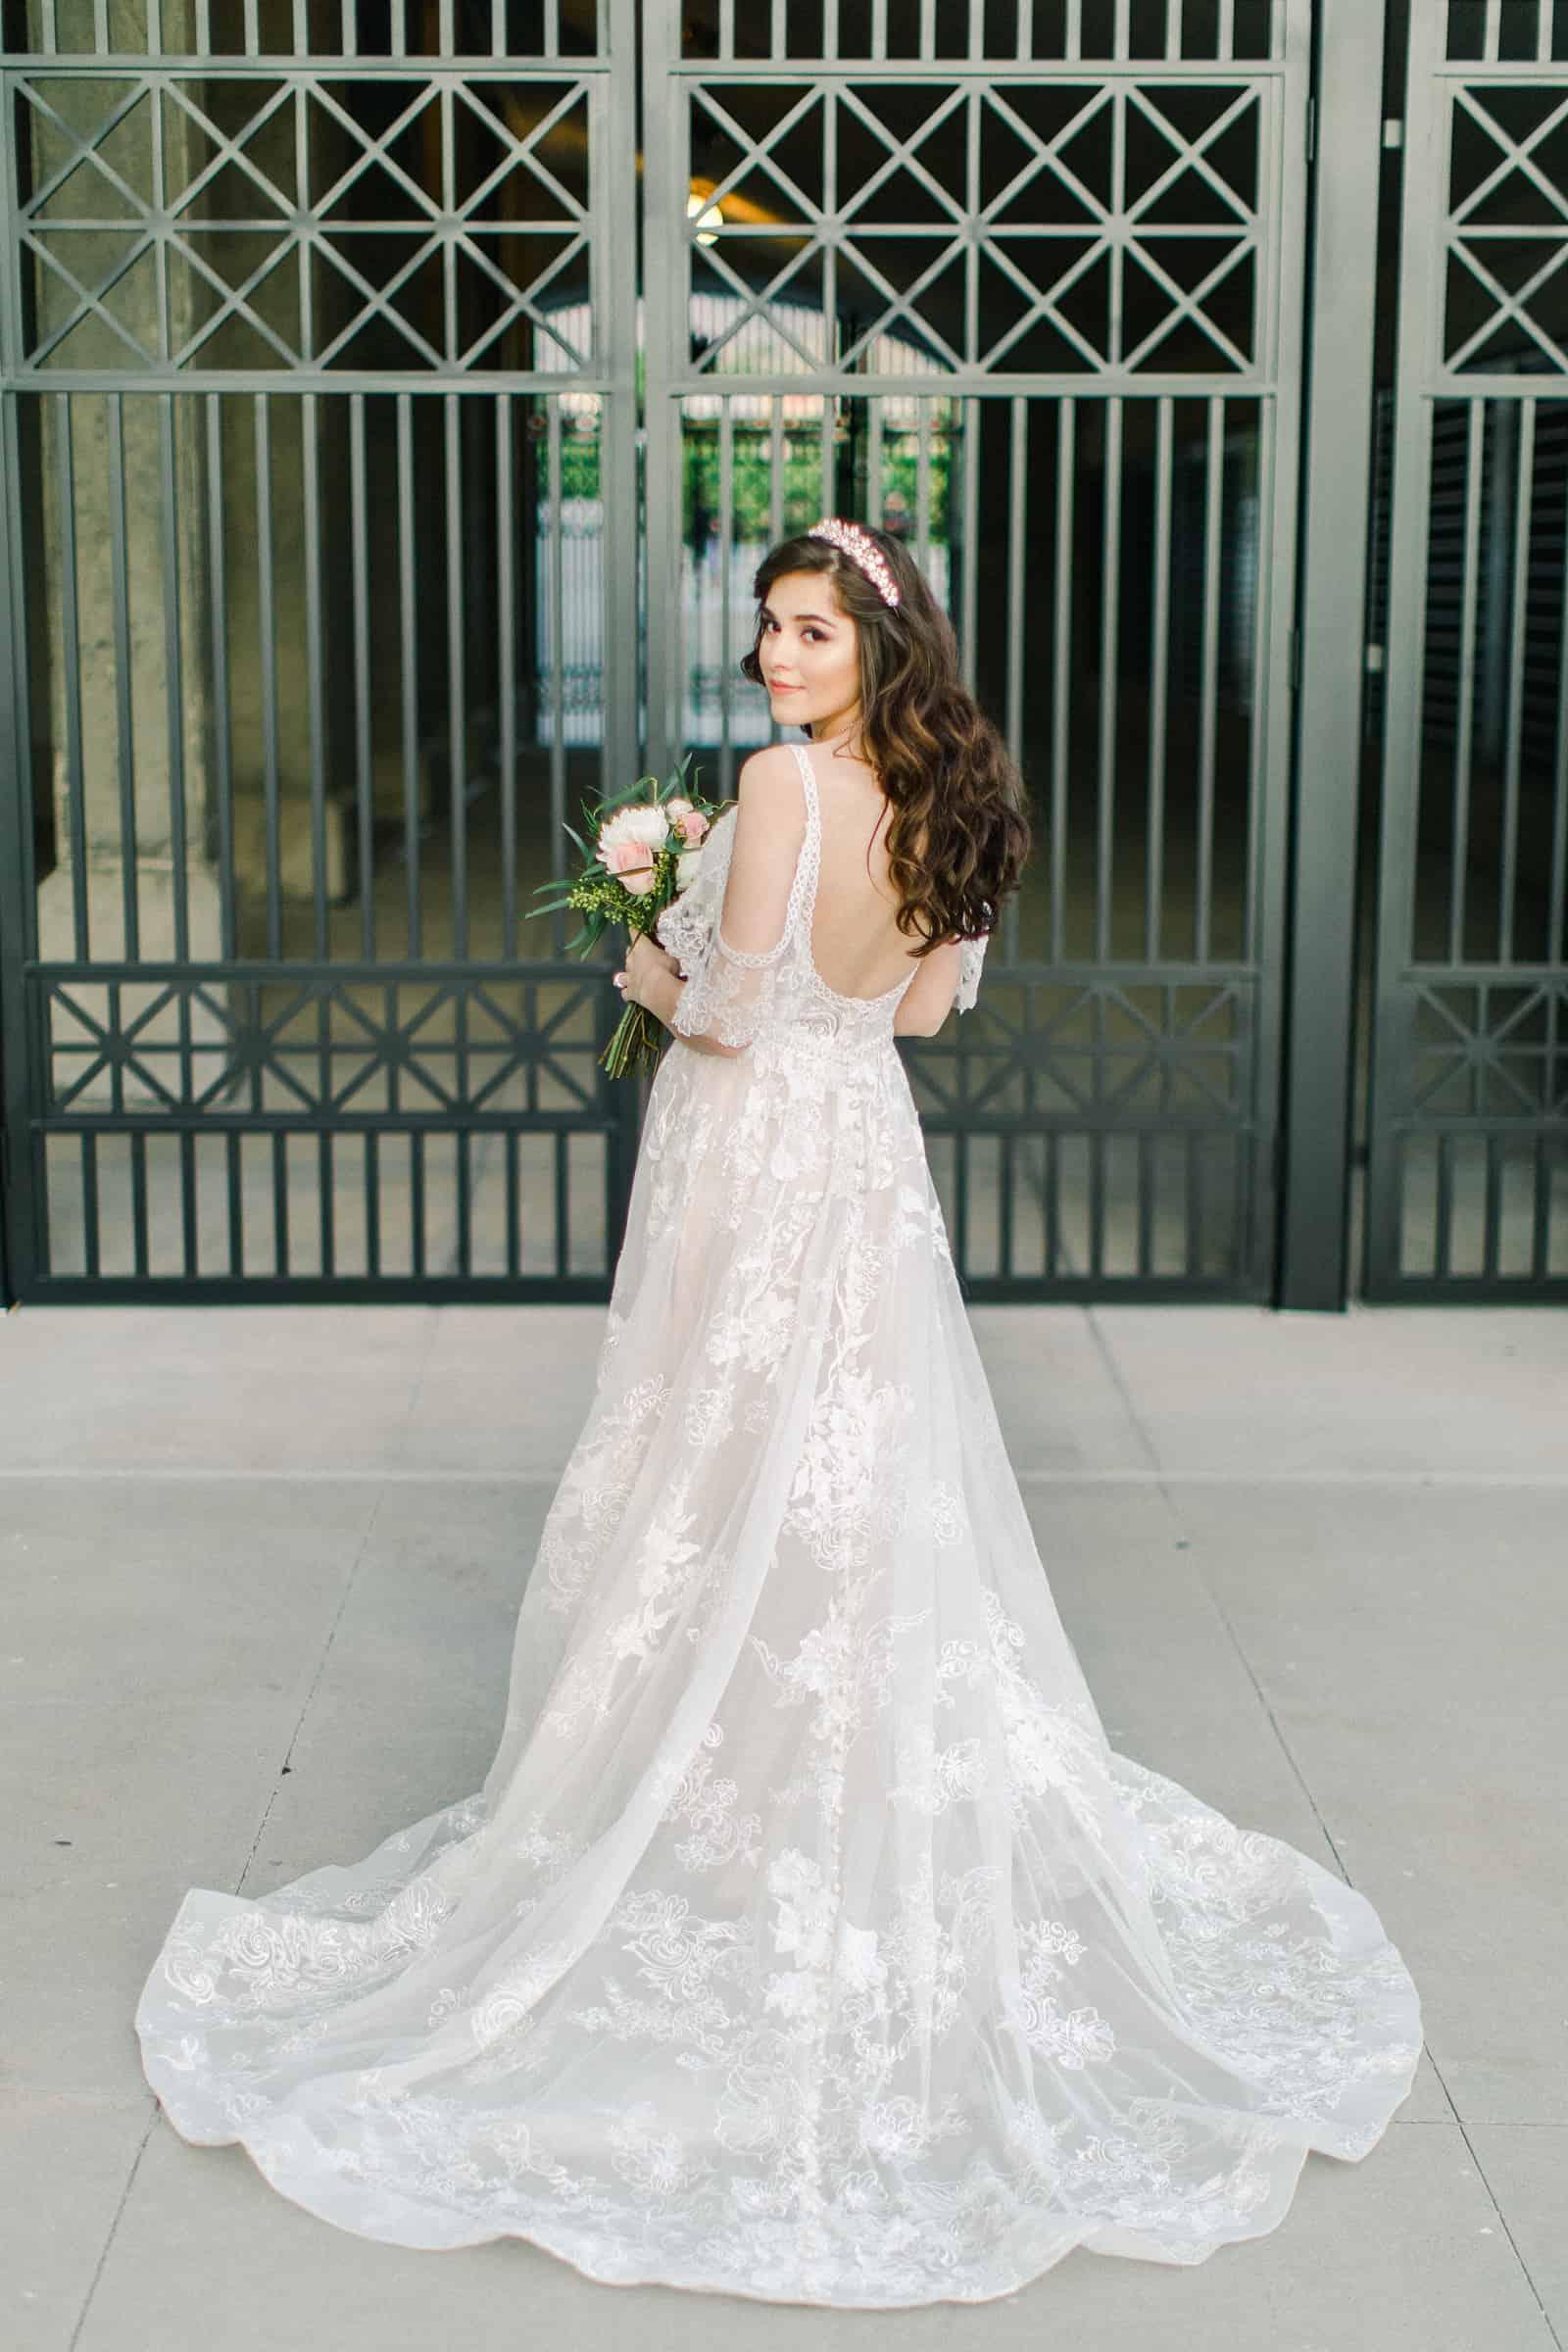 Palestinian Iranian Bride and Groom, Utah Wedding Photography at the Utah State Capitol, beautiful bride low back boho lace wedding dress